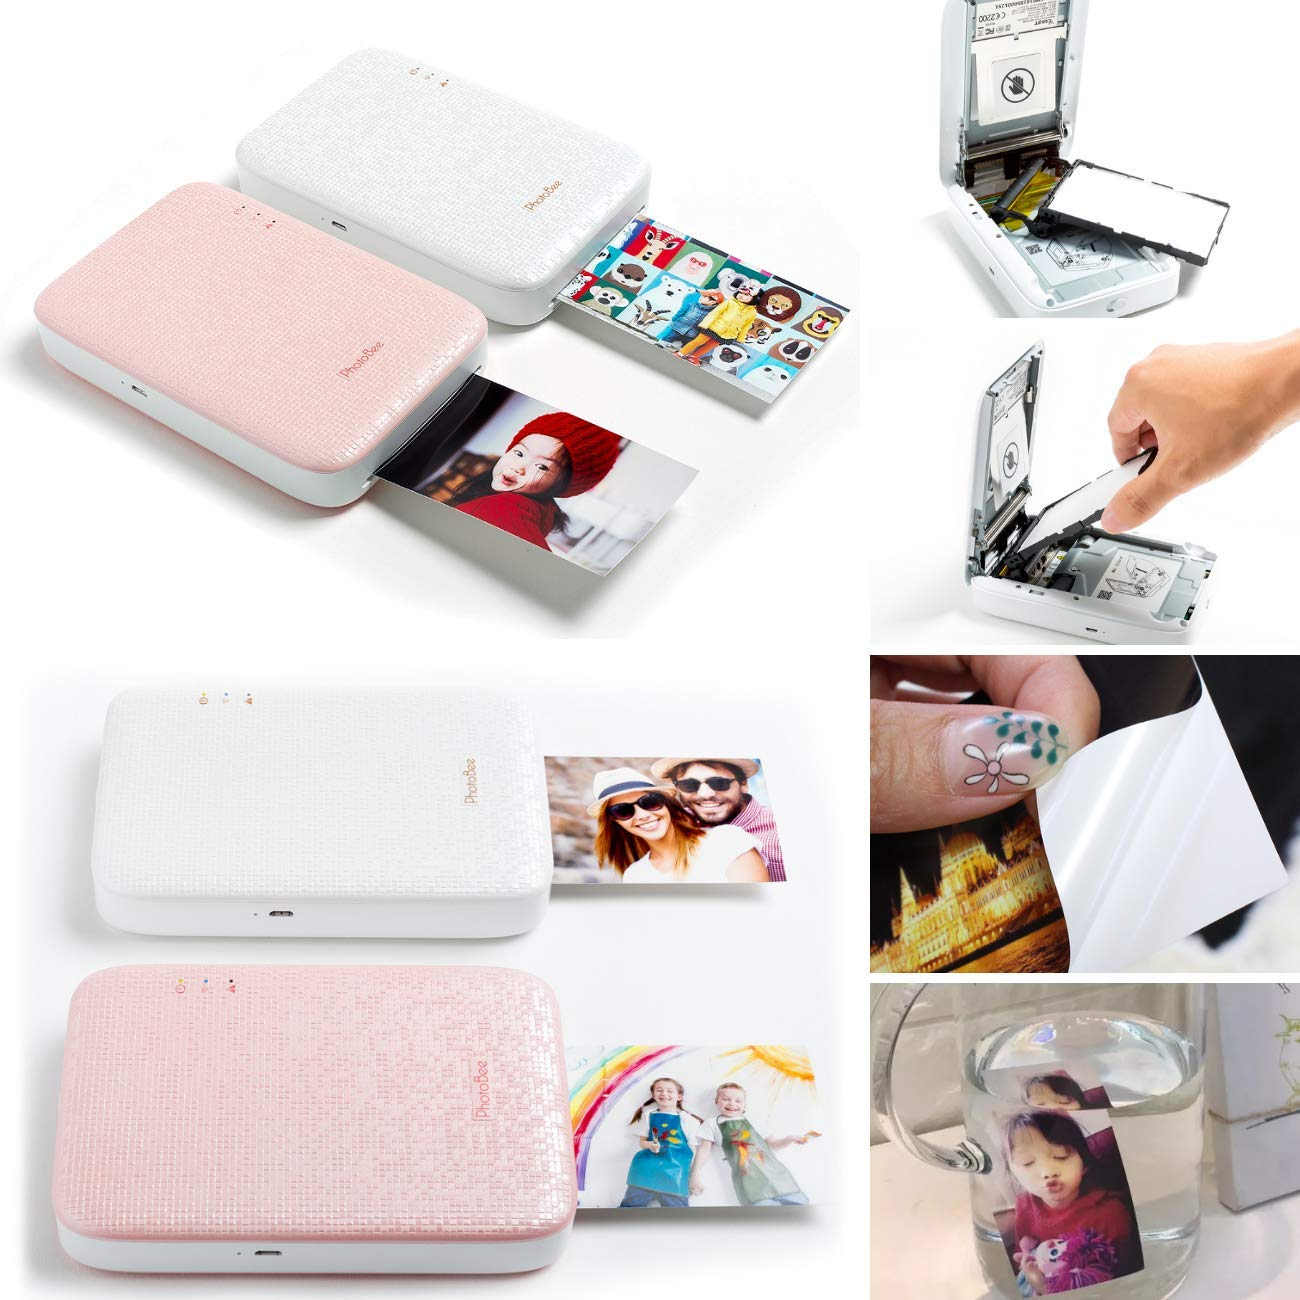 Photobee Portable Sticker Photo Printer - Pink: Amazon.in: Electronics